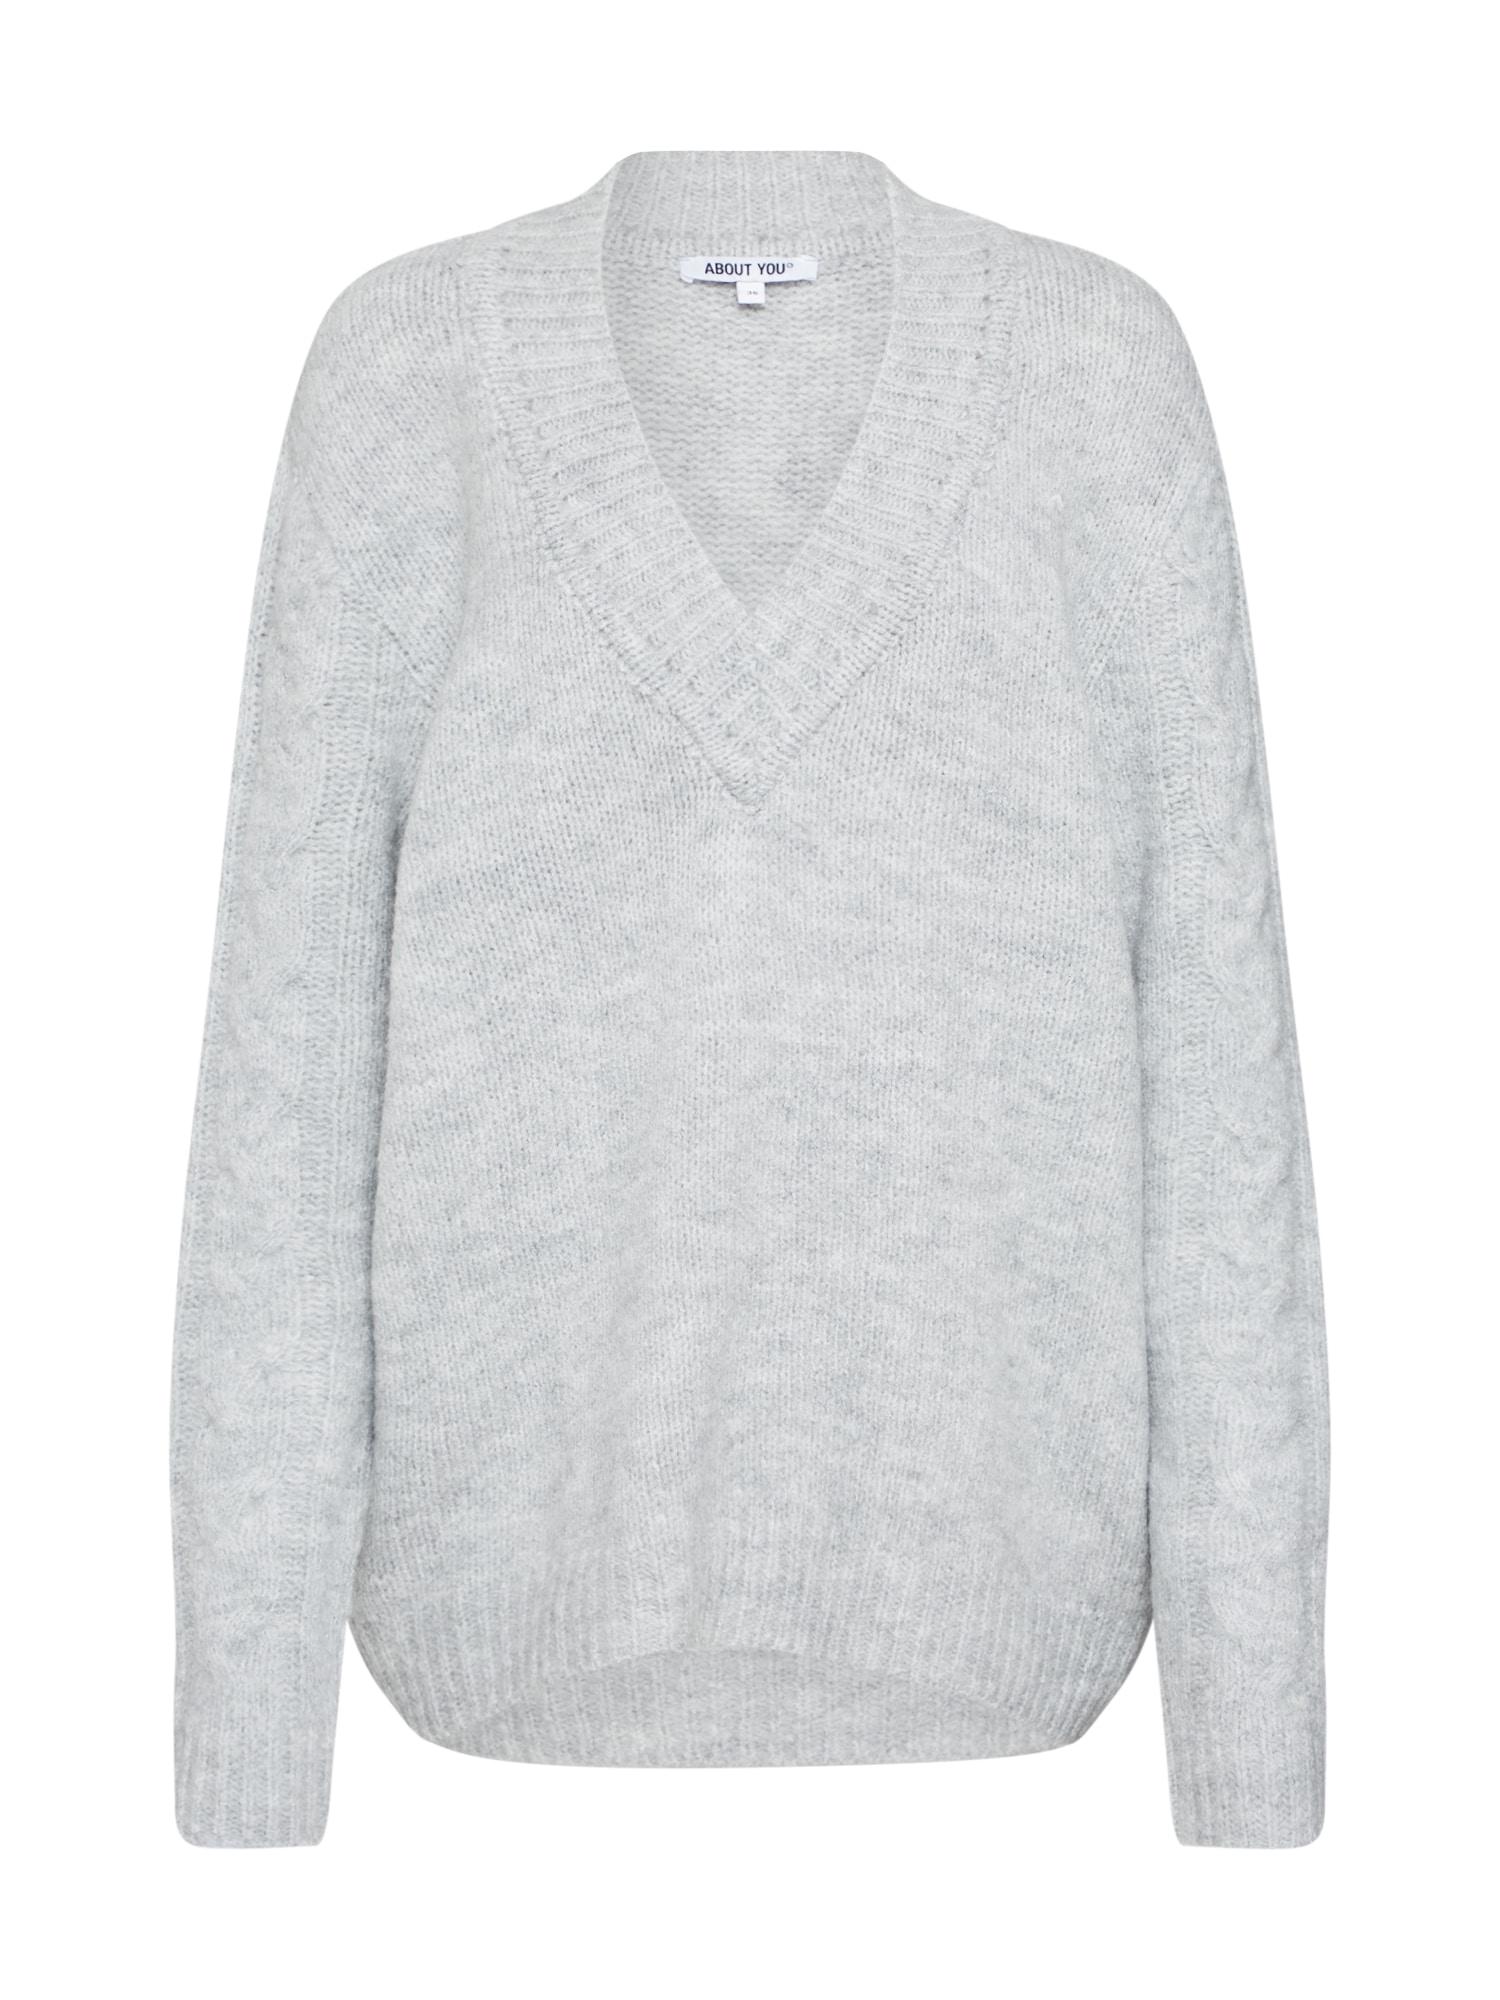 ABOUT YOU Megztinis 'Milena' šviesiai pilka